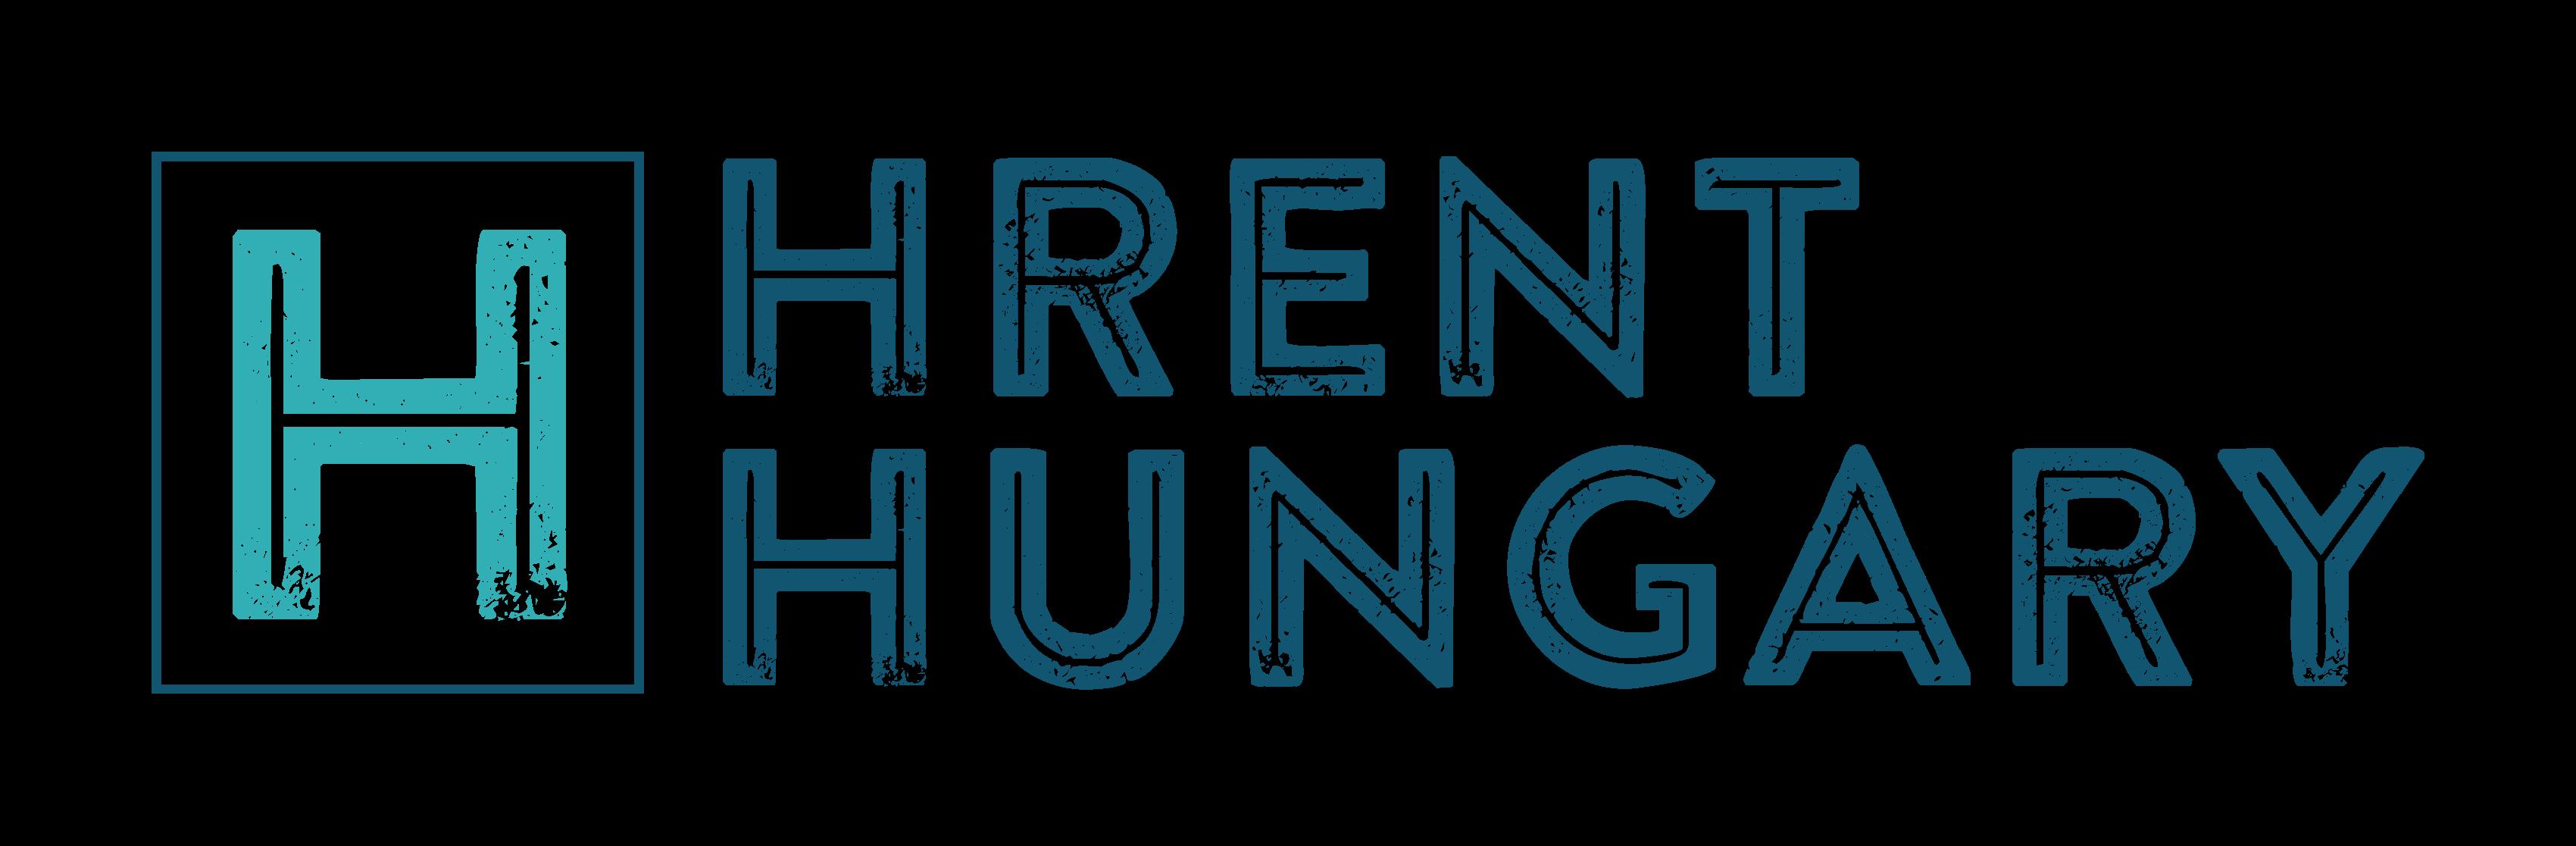 HRent Hungary